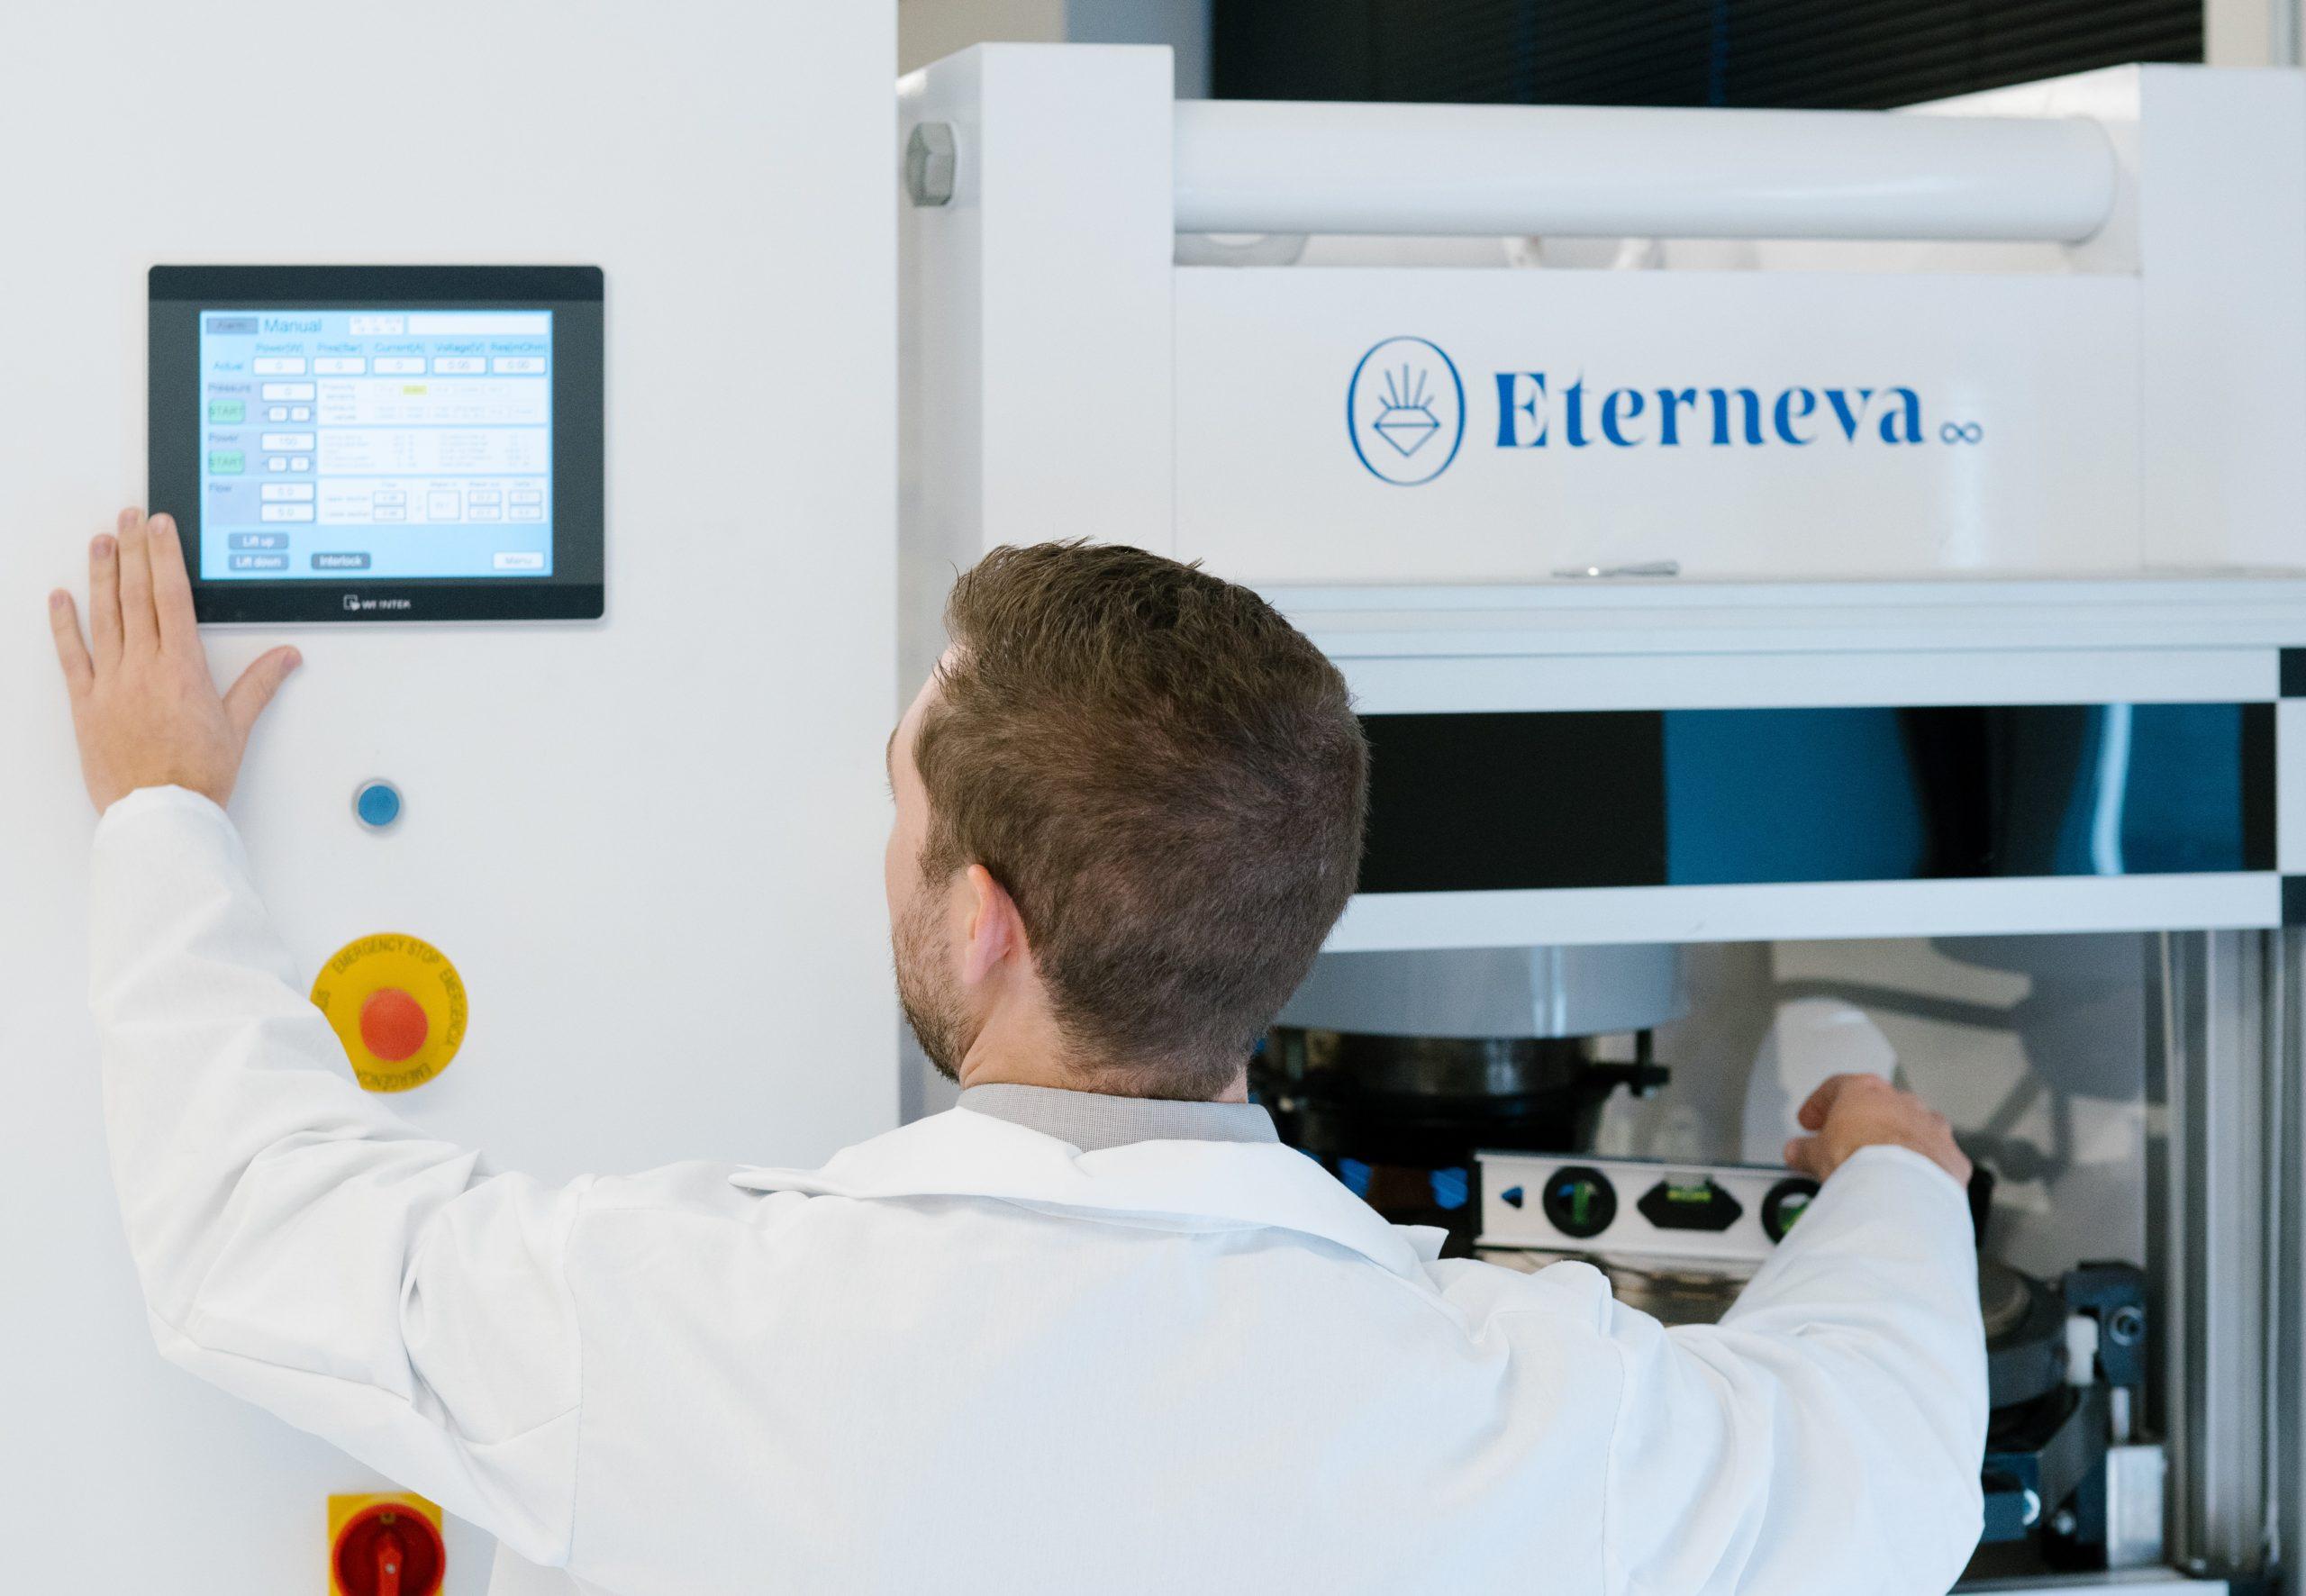 eterneva scientist uses computer console